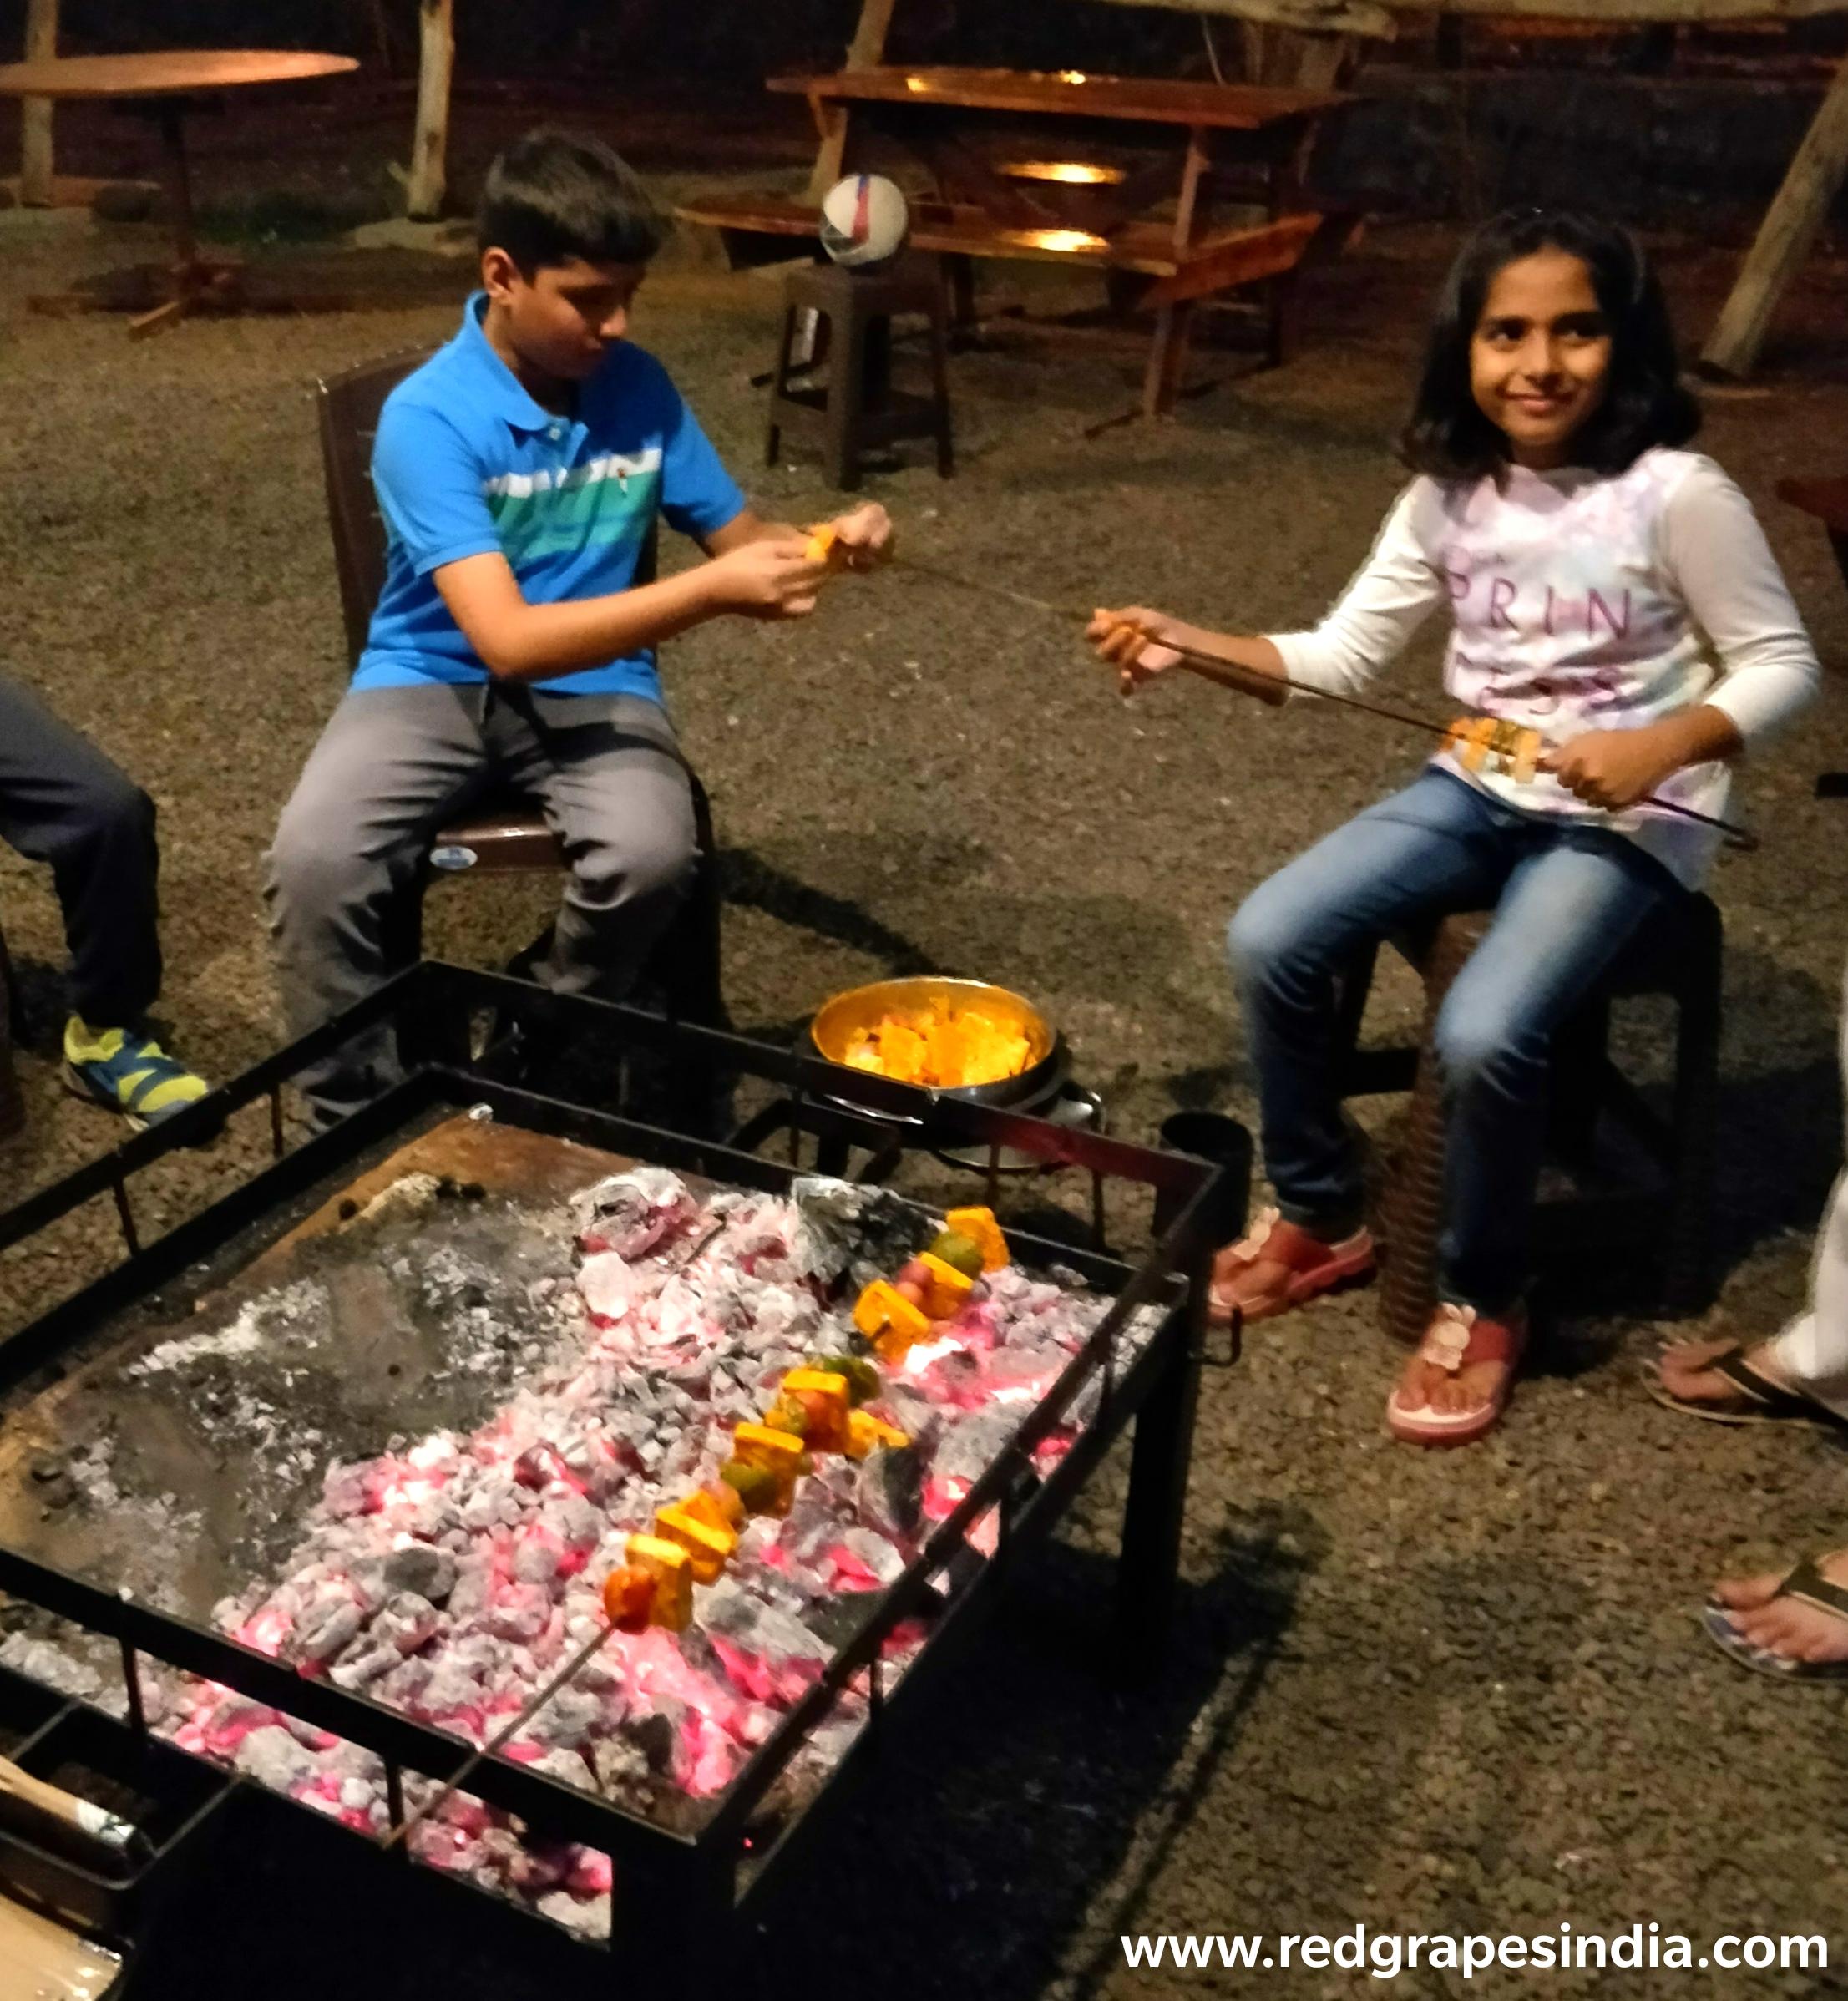 Kids enjoying BBQ, barbeque at wine information center at wine park